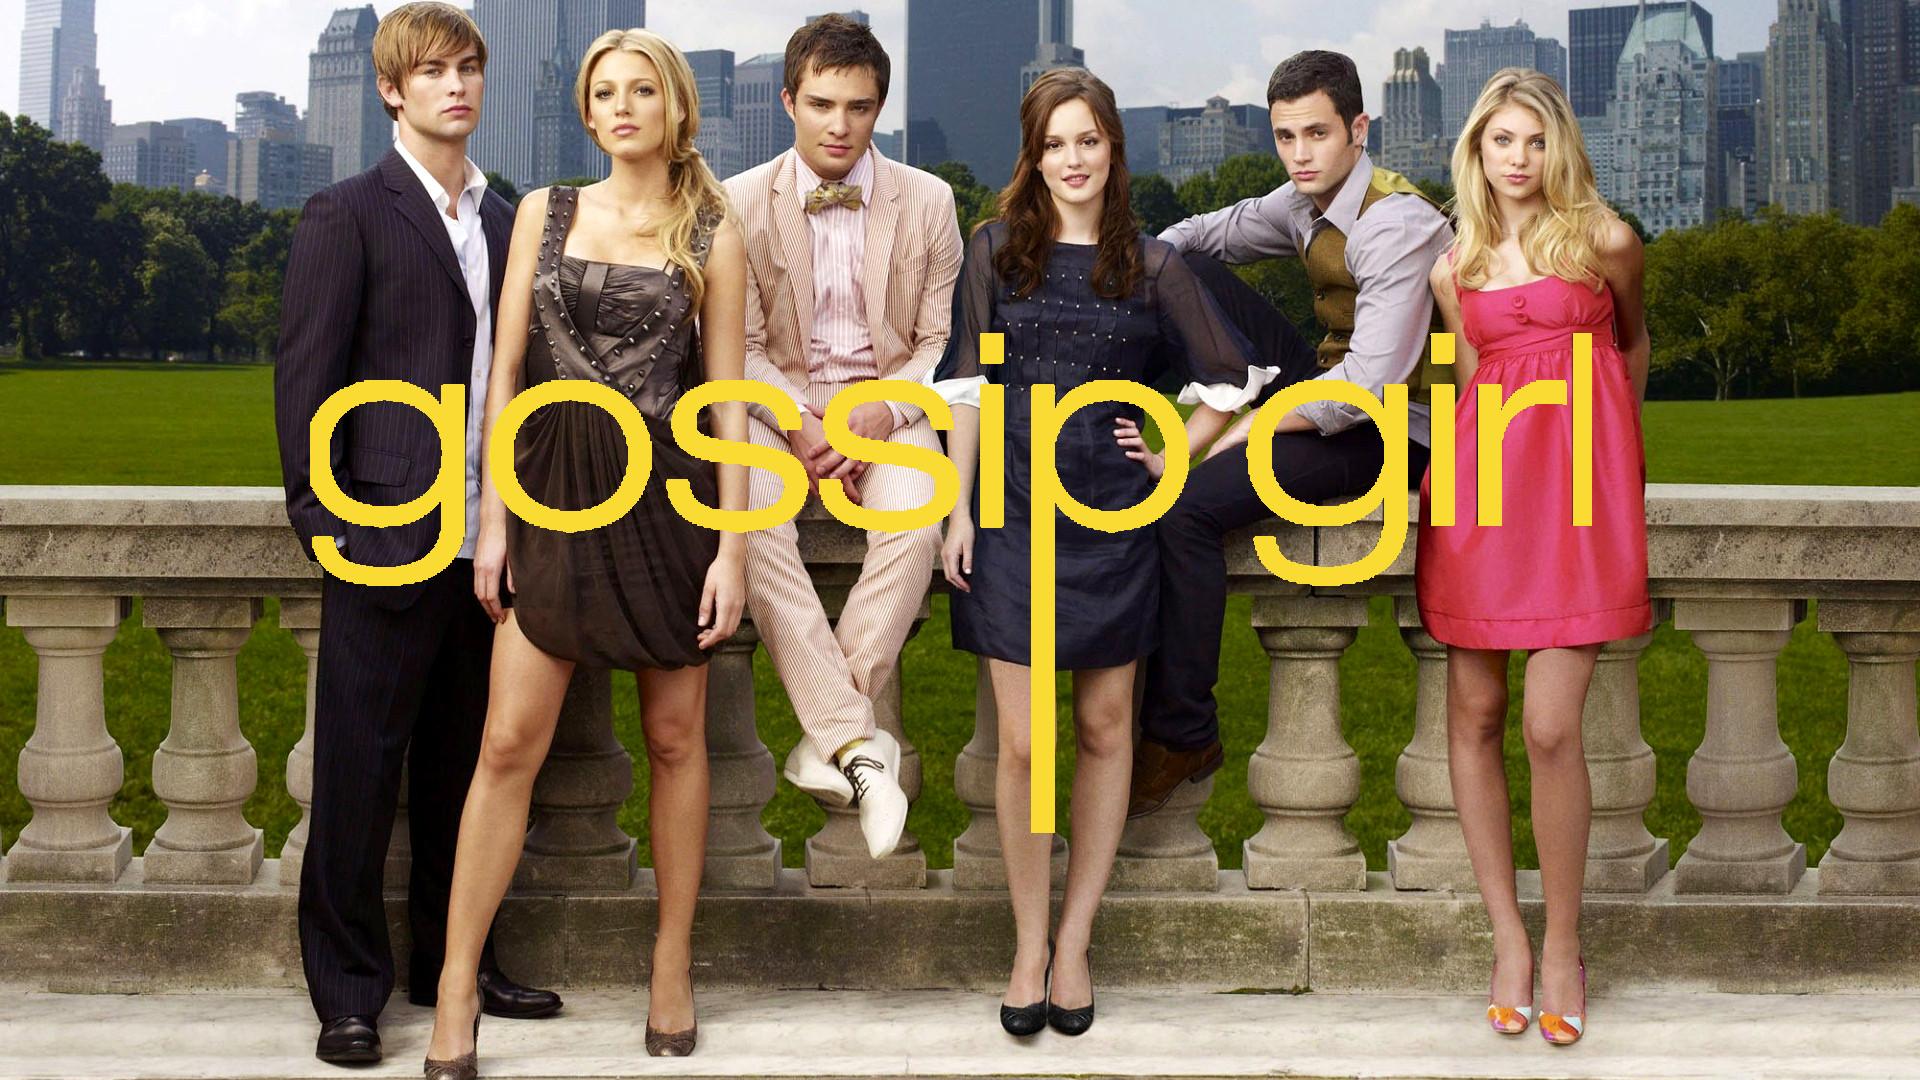 Gossip girl strips